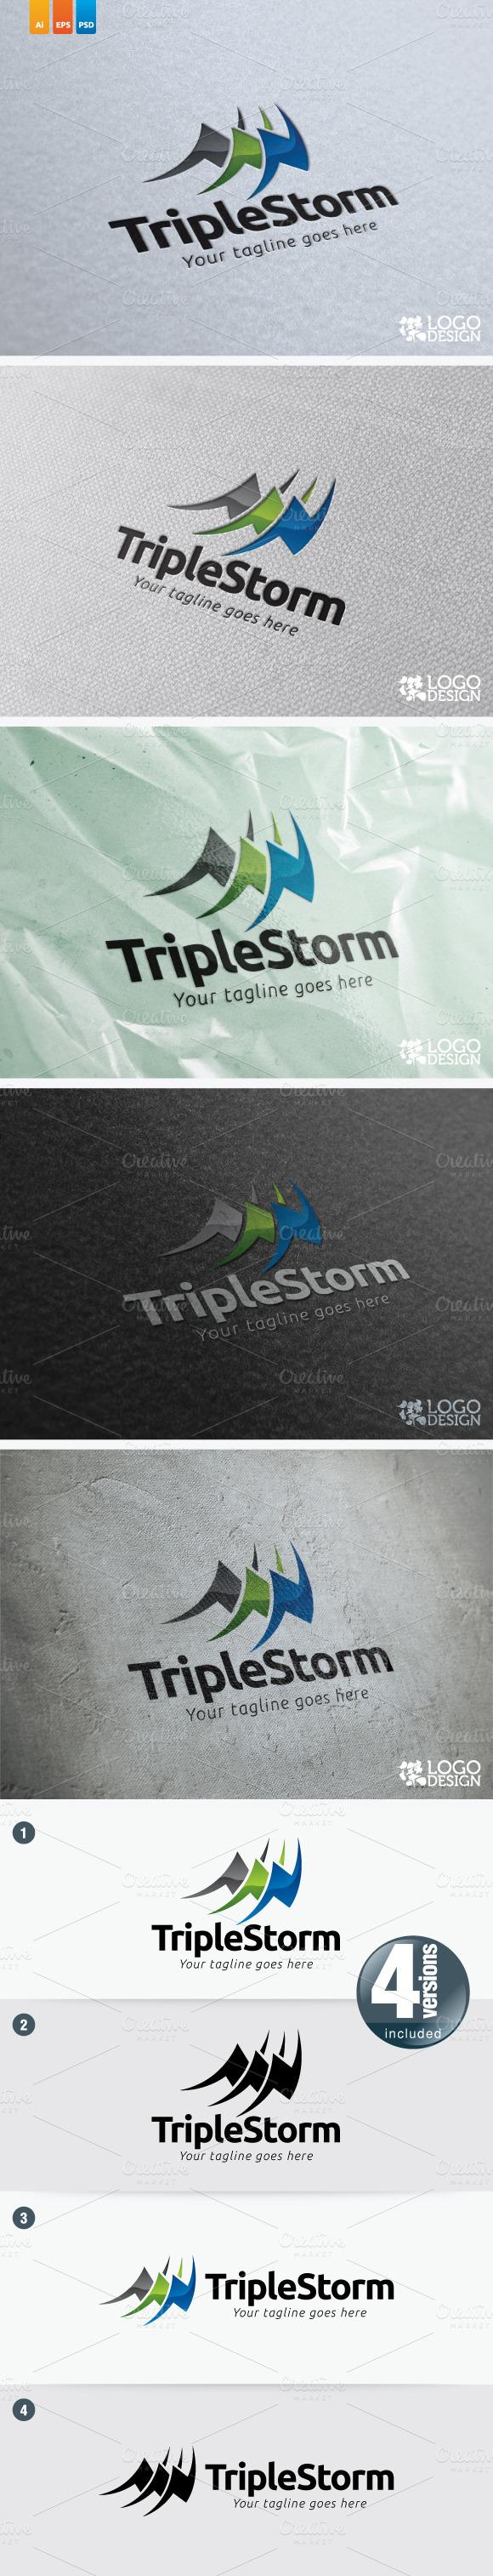 Triple Storm